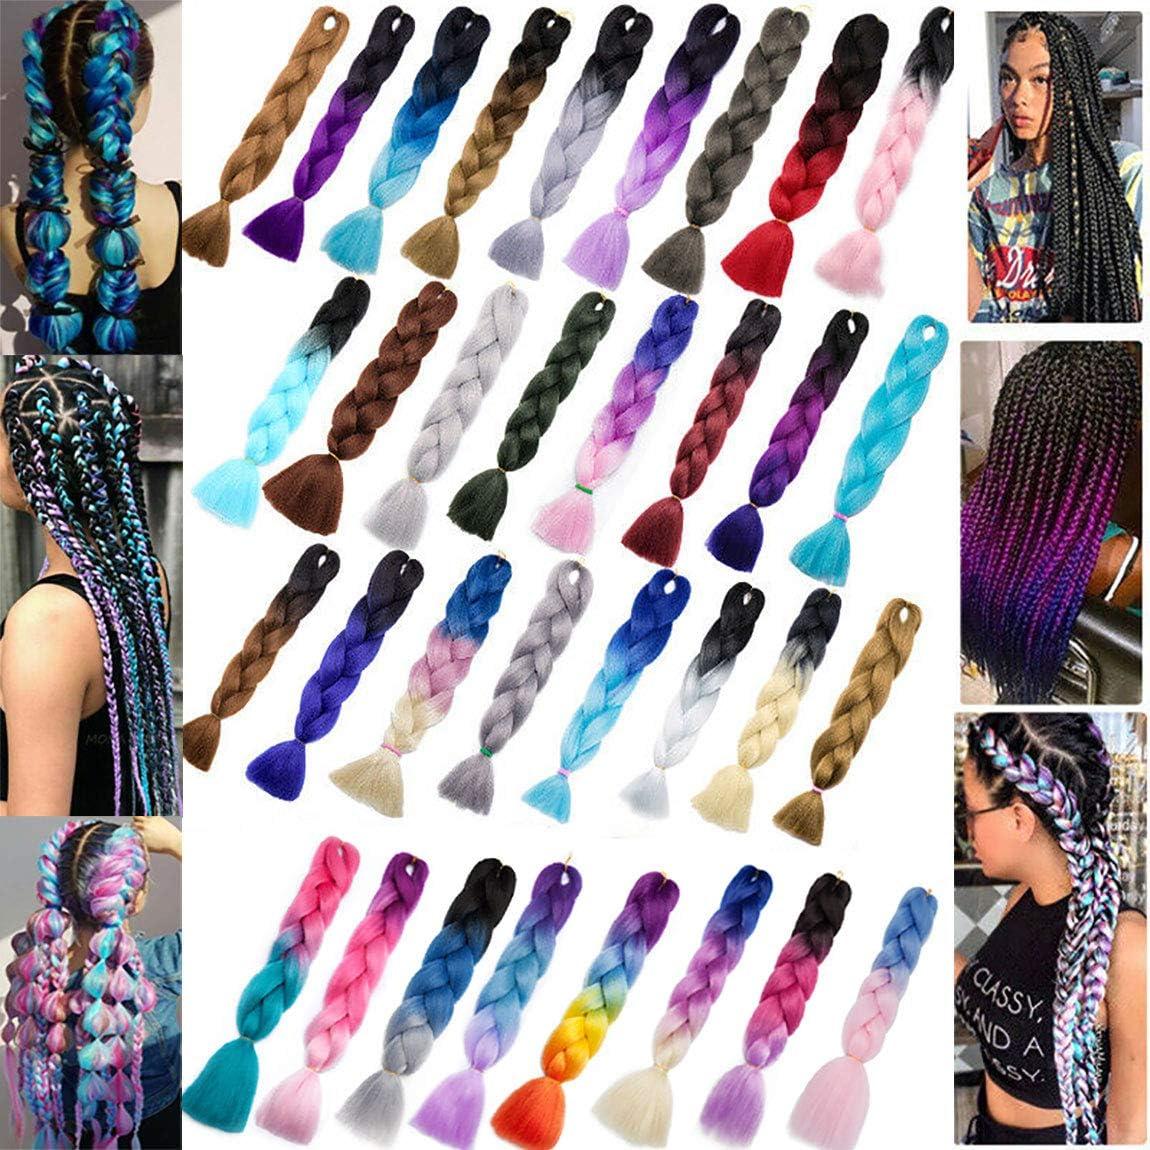 Ombre Braids Hair Jumbo Braiding Hair Synthetic Hair Extensions for Braiding Crochet Twist Box Braids 24Inch 1 Packs Ash Blonde